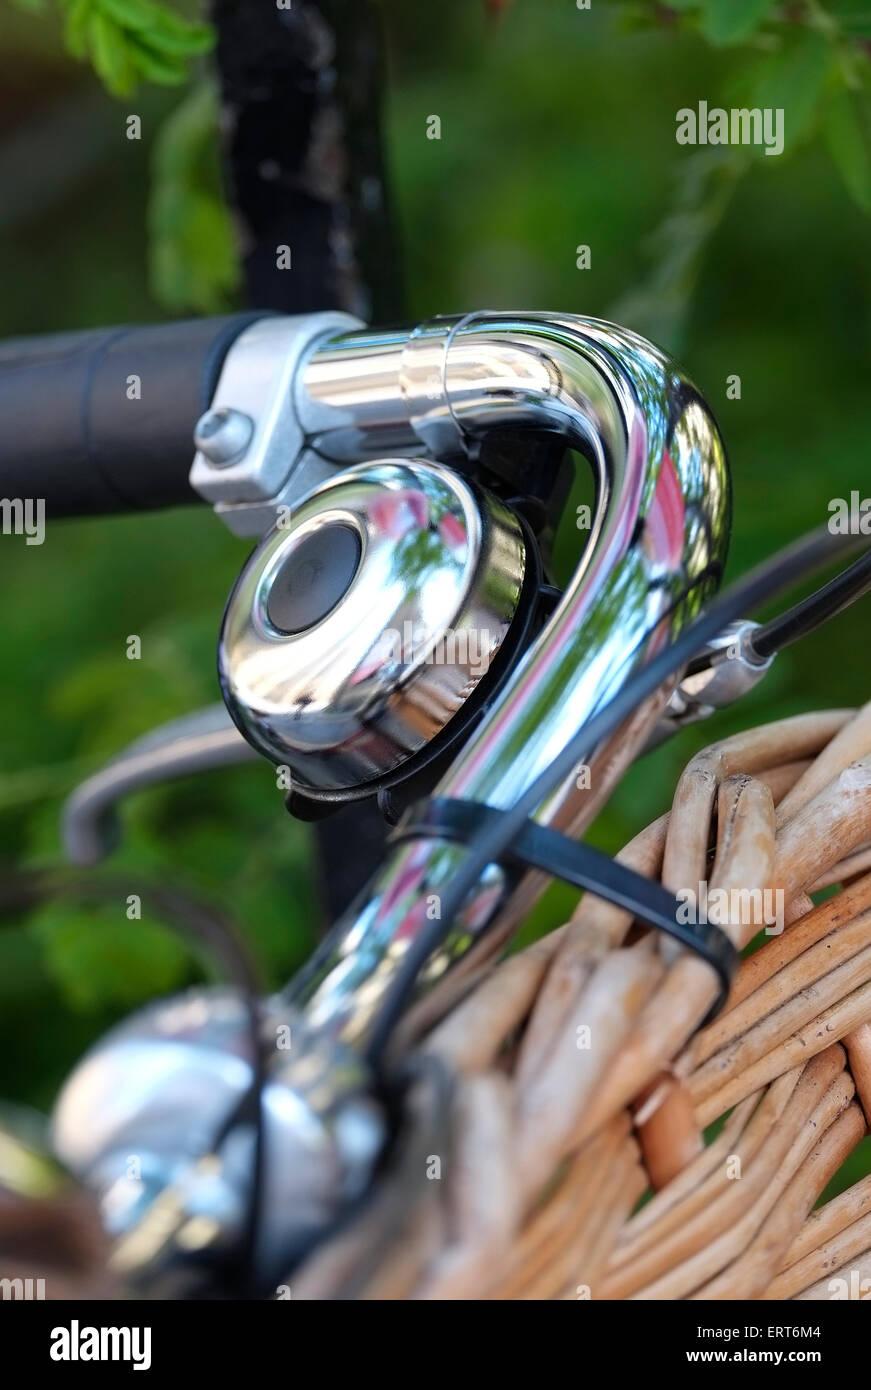 chromium bell on cycle handlebars, cambridge, england - Stock Image